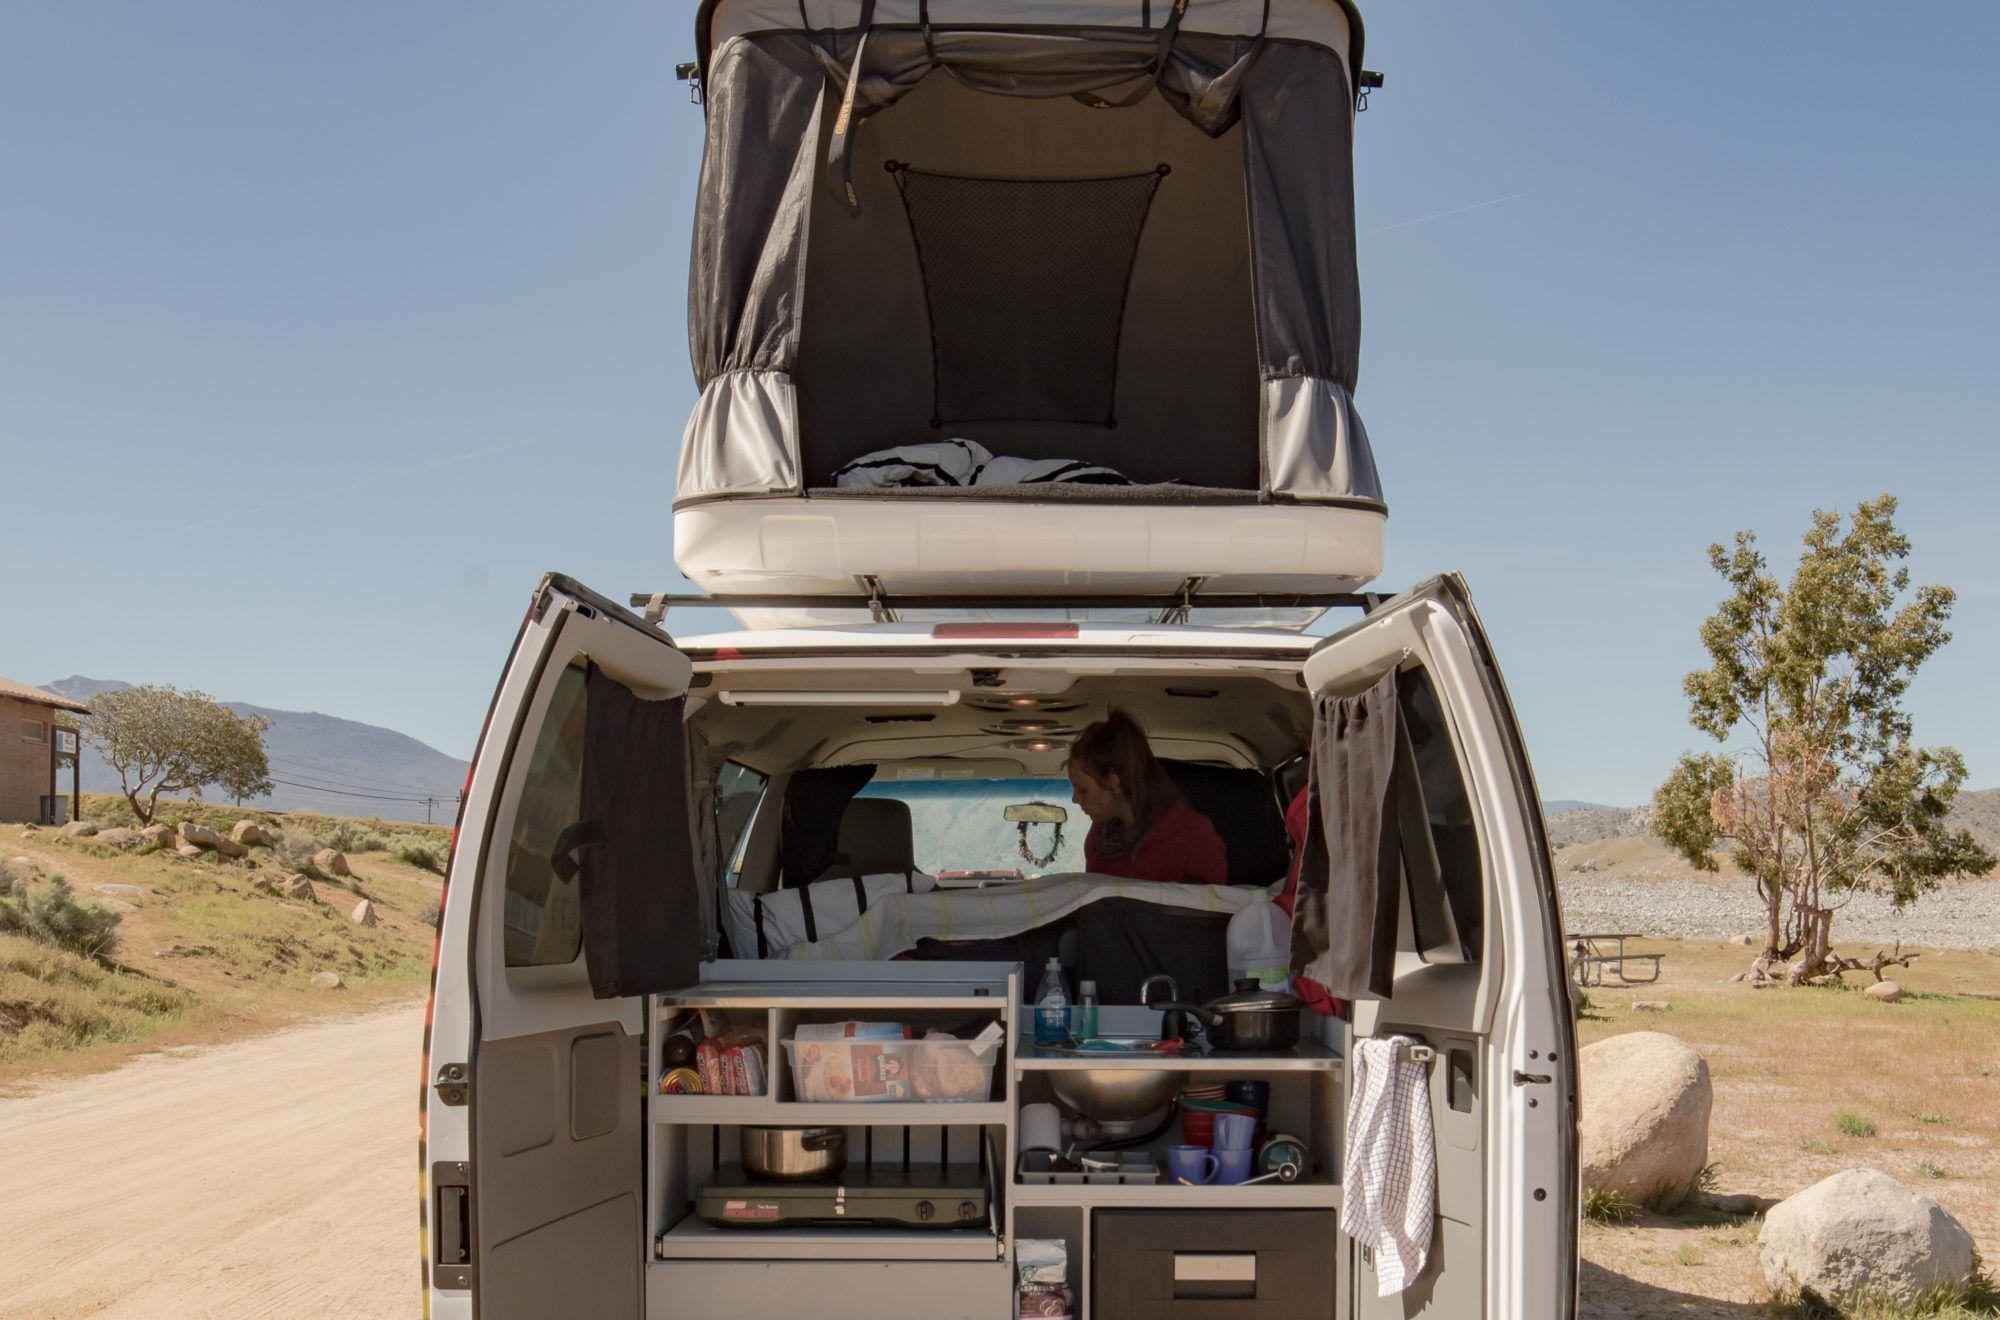 Mavericks Campervan 4 Berth Campervan Rental 4 Berth Campervan